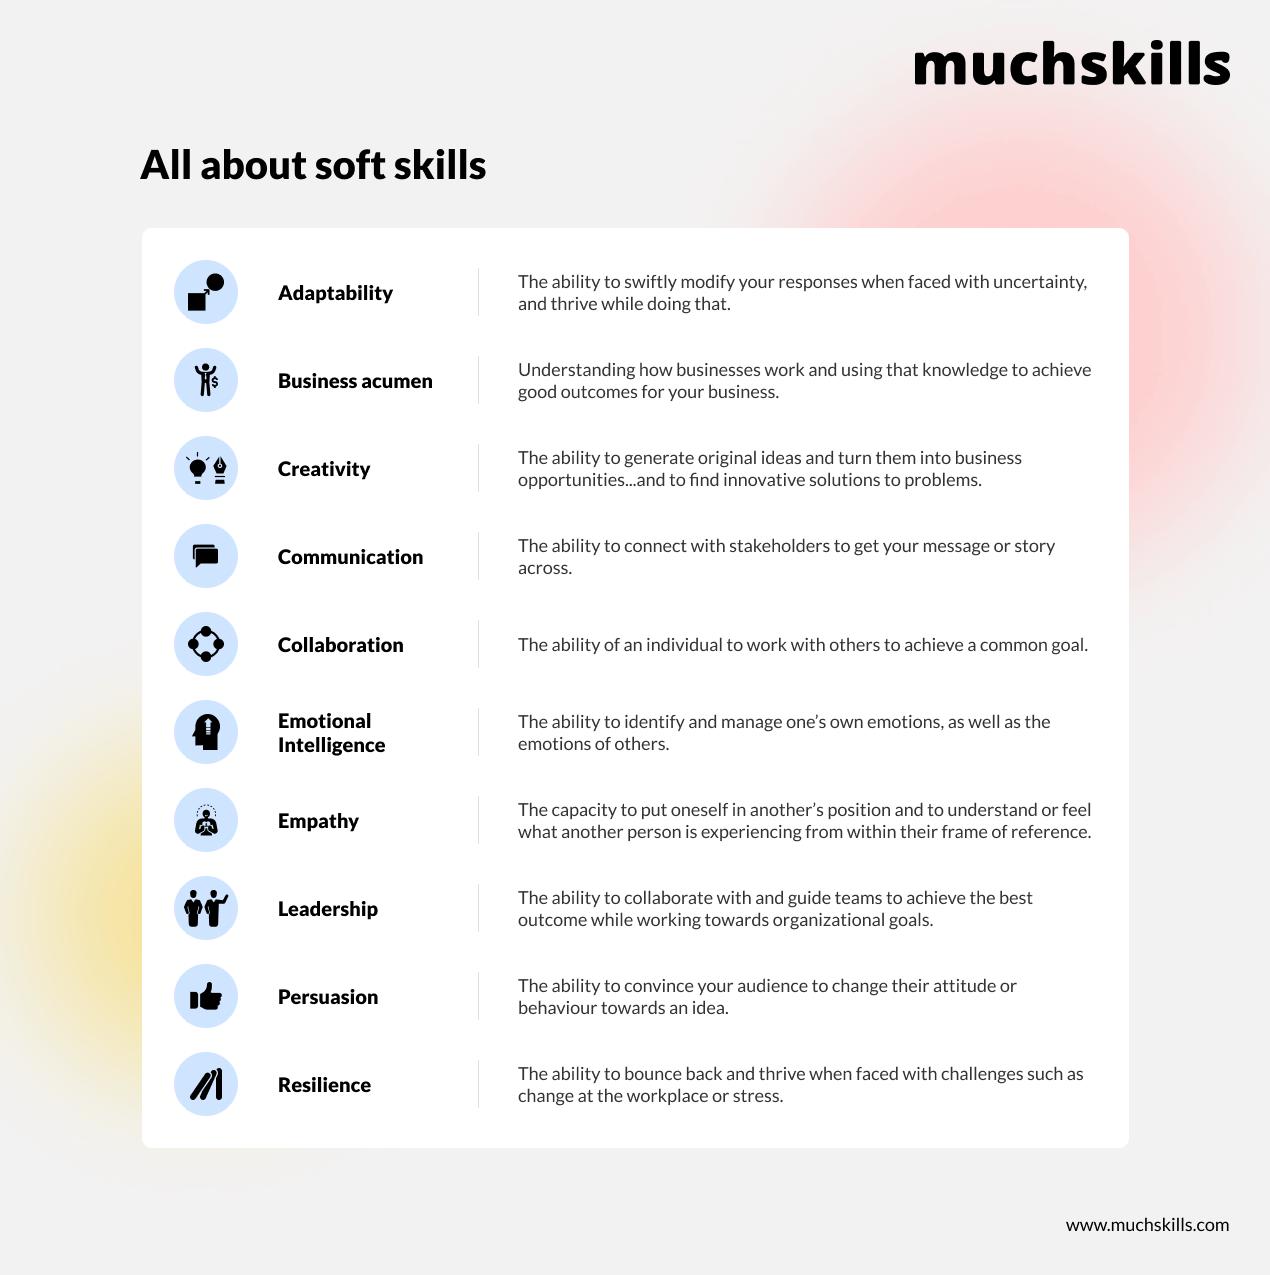 All about soft skills - Adaptability, Business Acumen, Creativity, Communication, Collaboration, Emotional Intelligence, Empathy, Leadership, Persuasion, Resilience